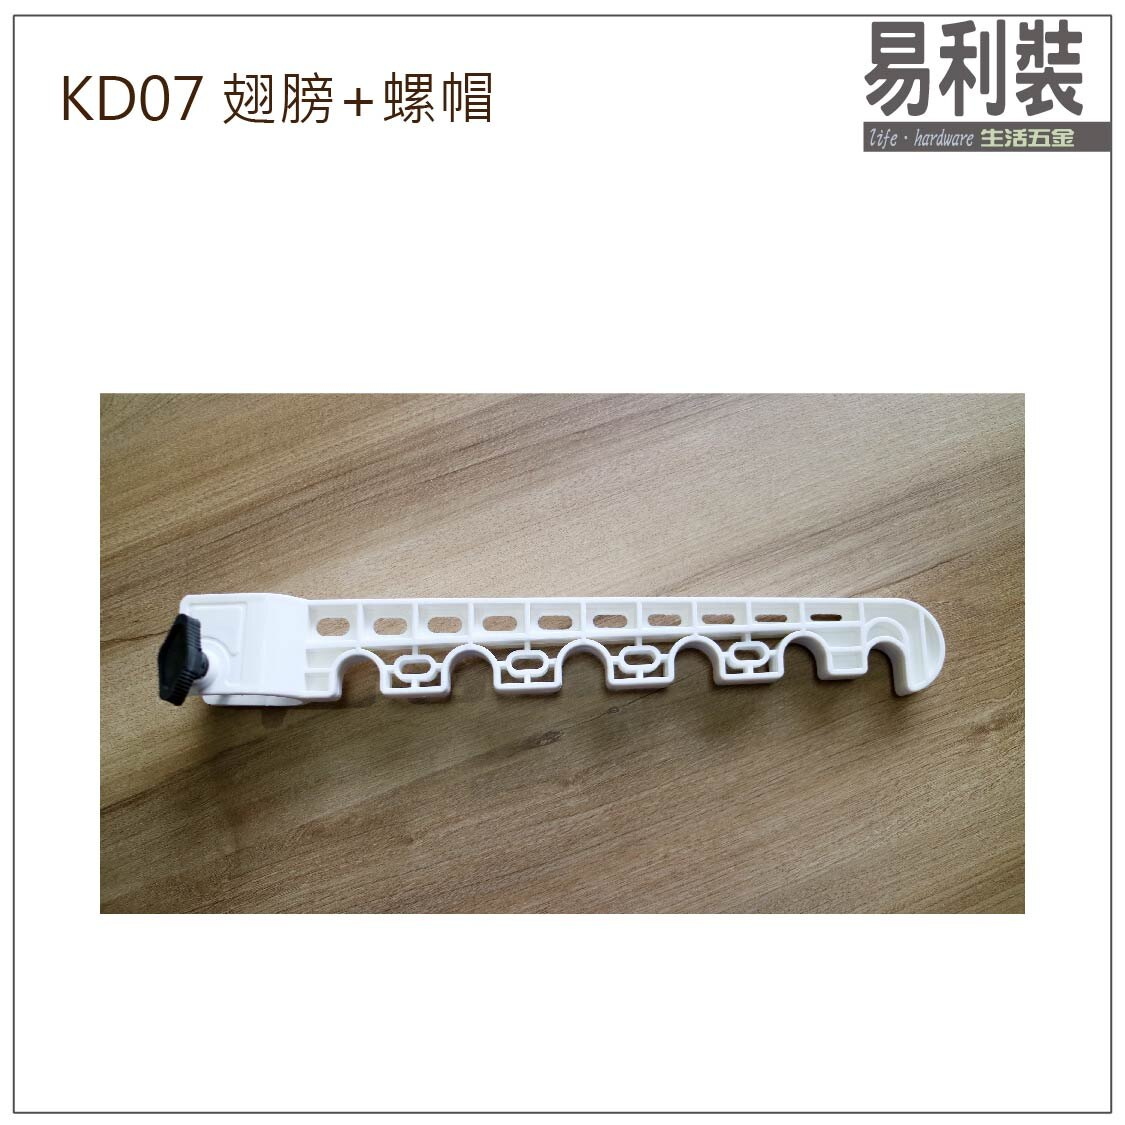 【 EASYCAN  】KD07 頂天立地組合配件 易利裝生活五金 翅膀 0